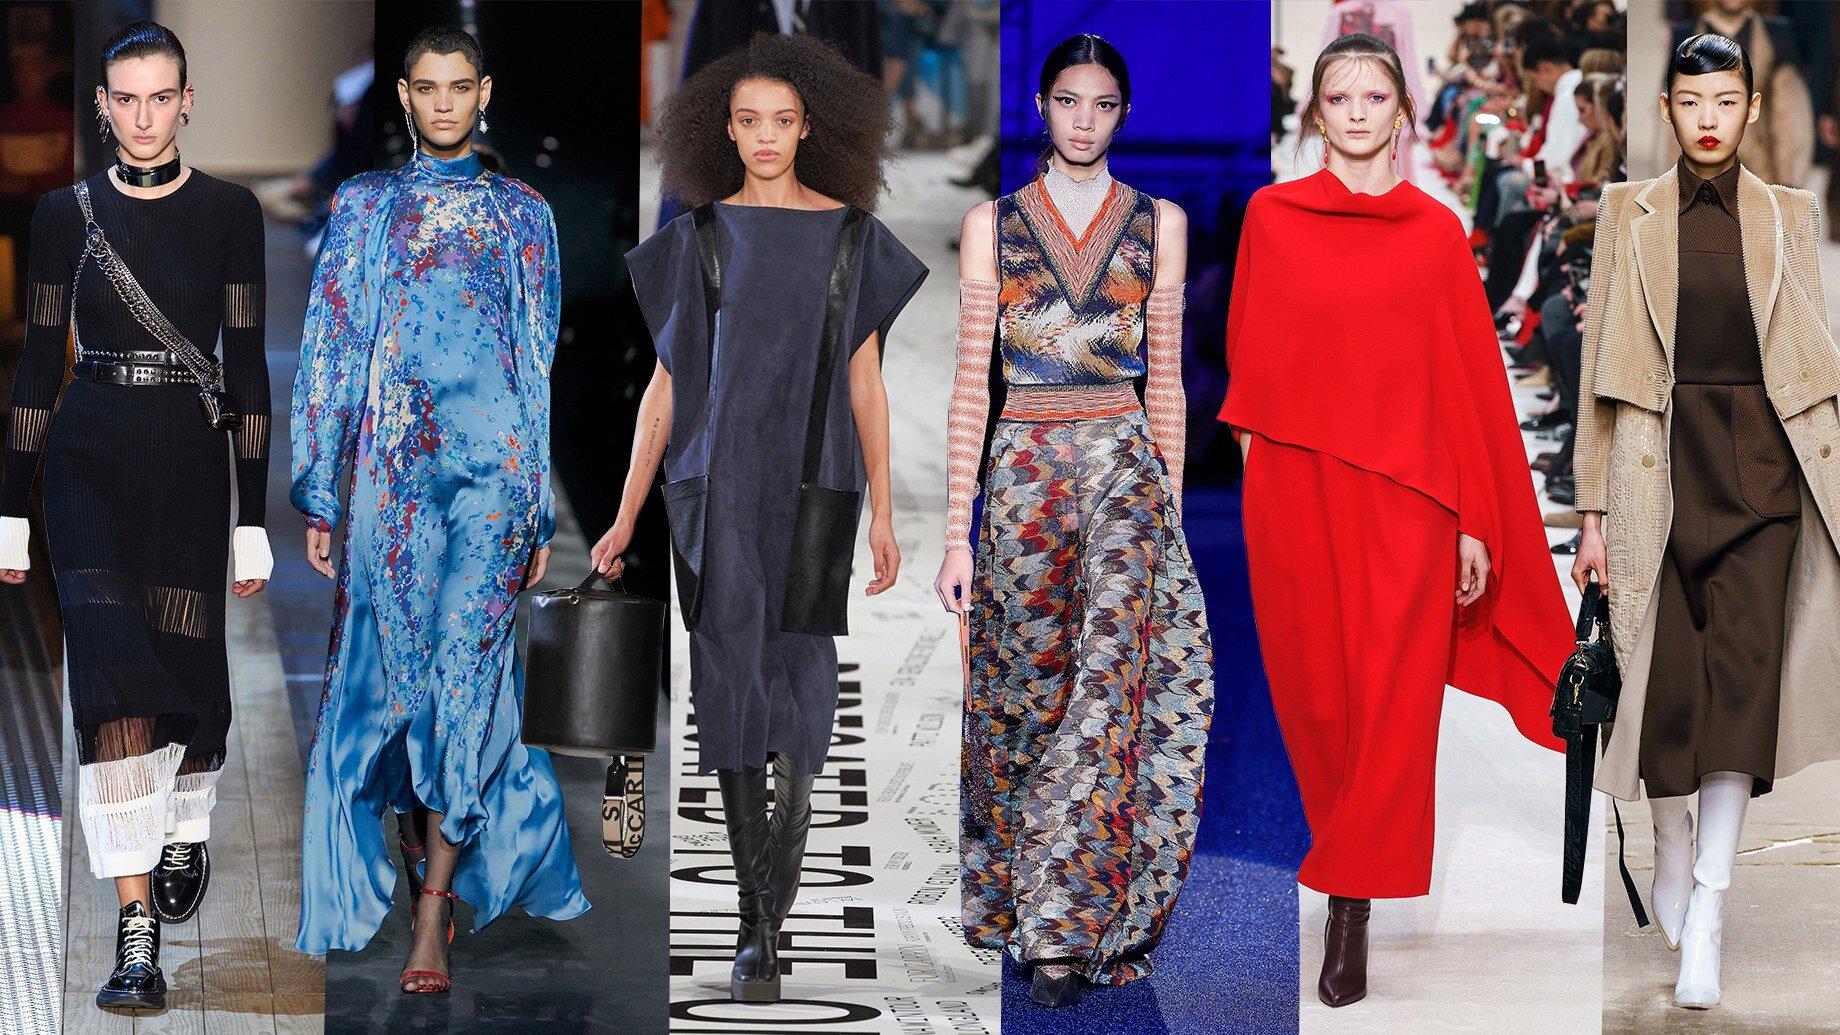 Fashion--vogue 6 unhappy models.jpg